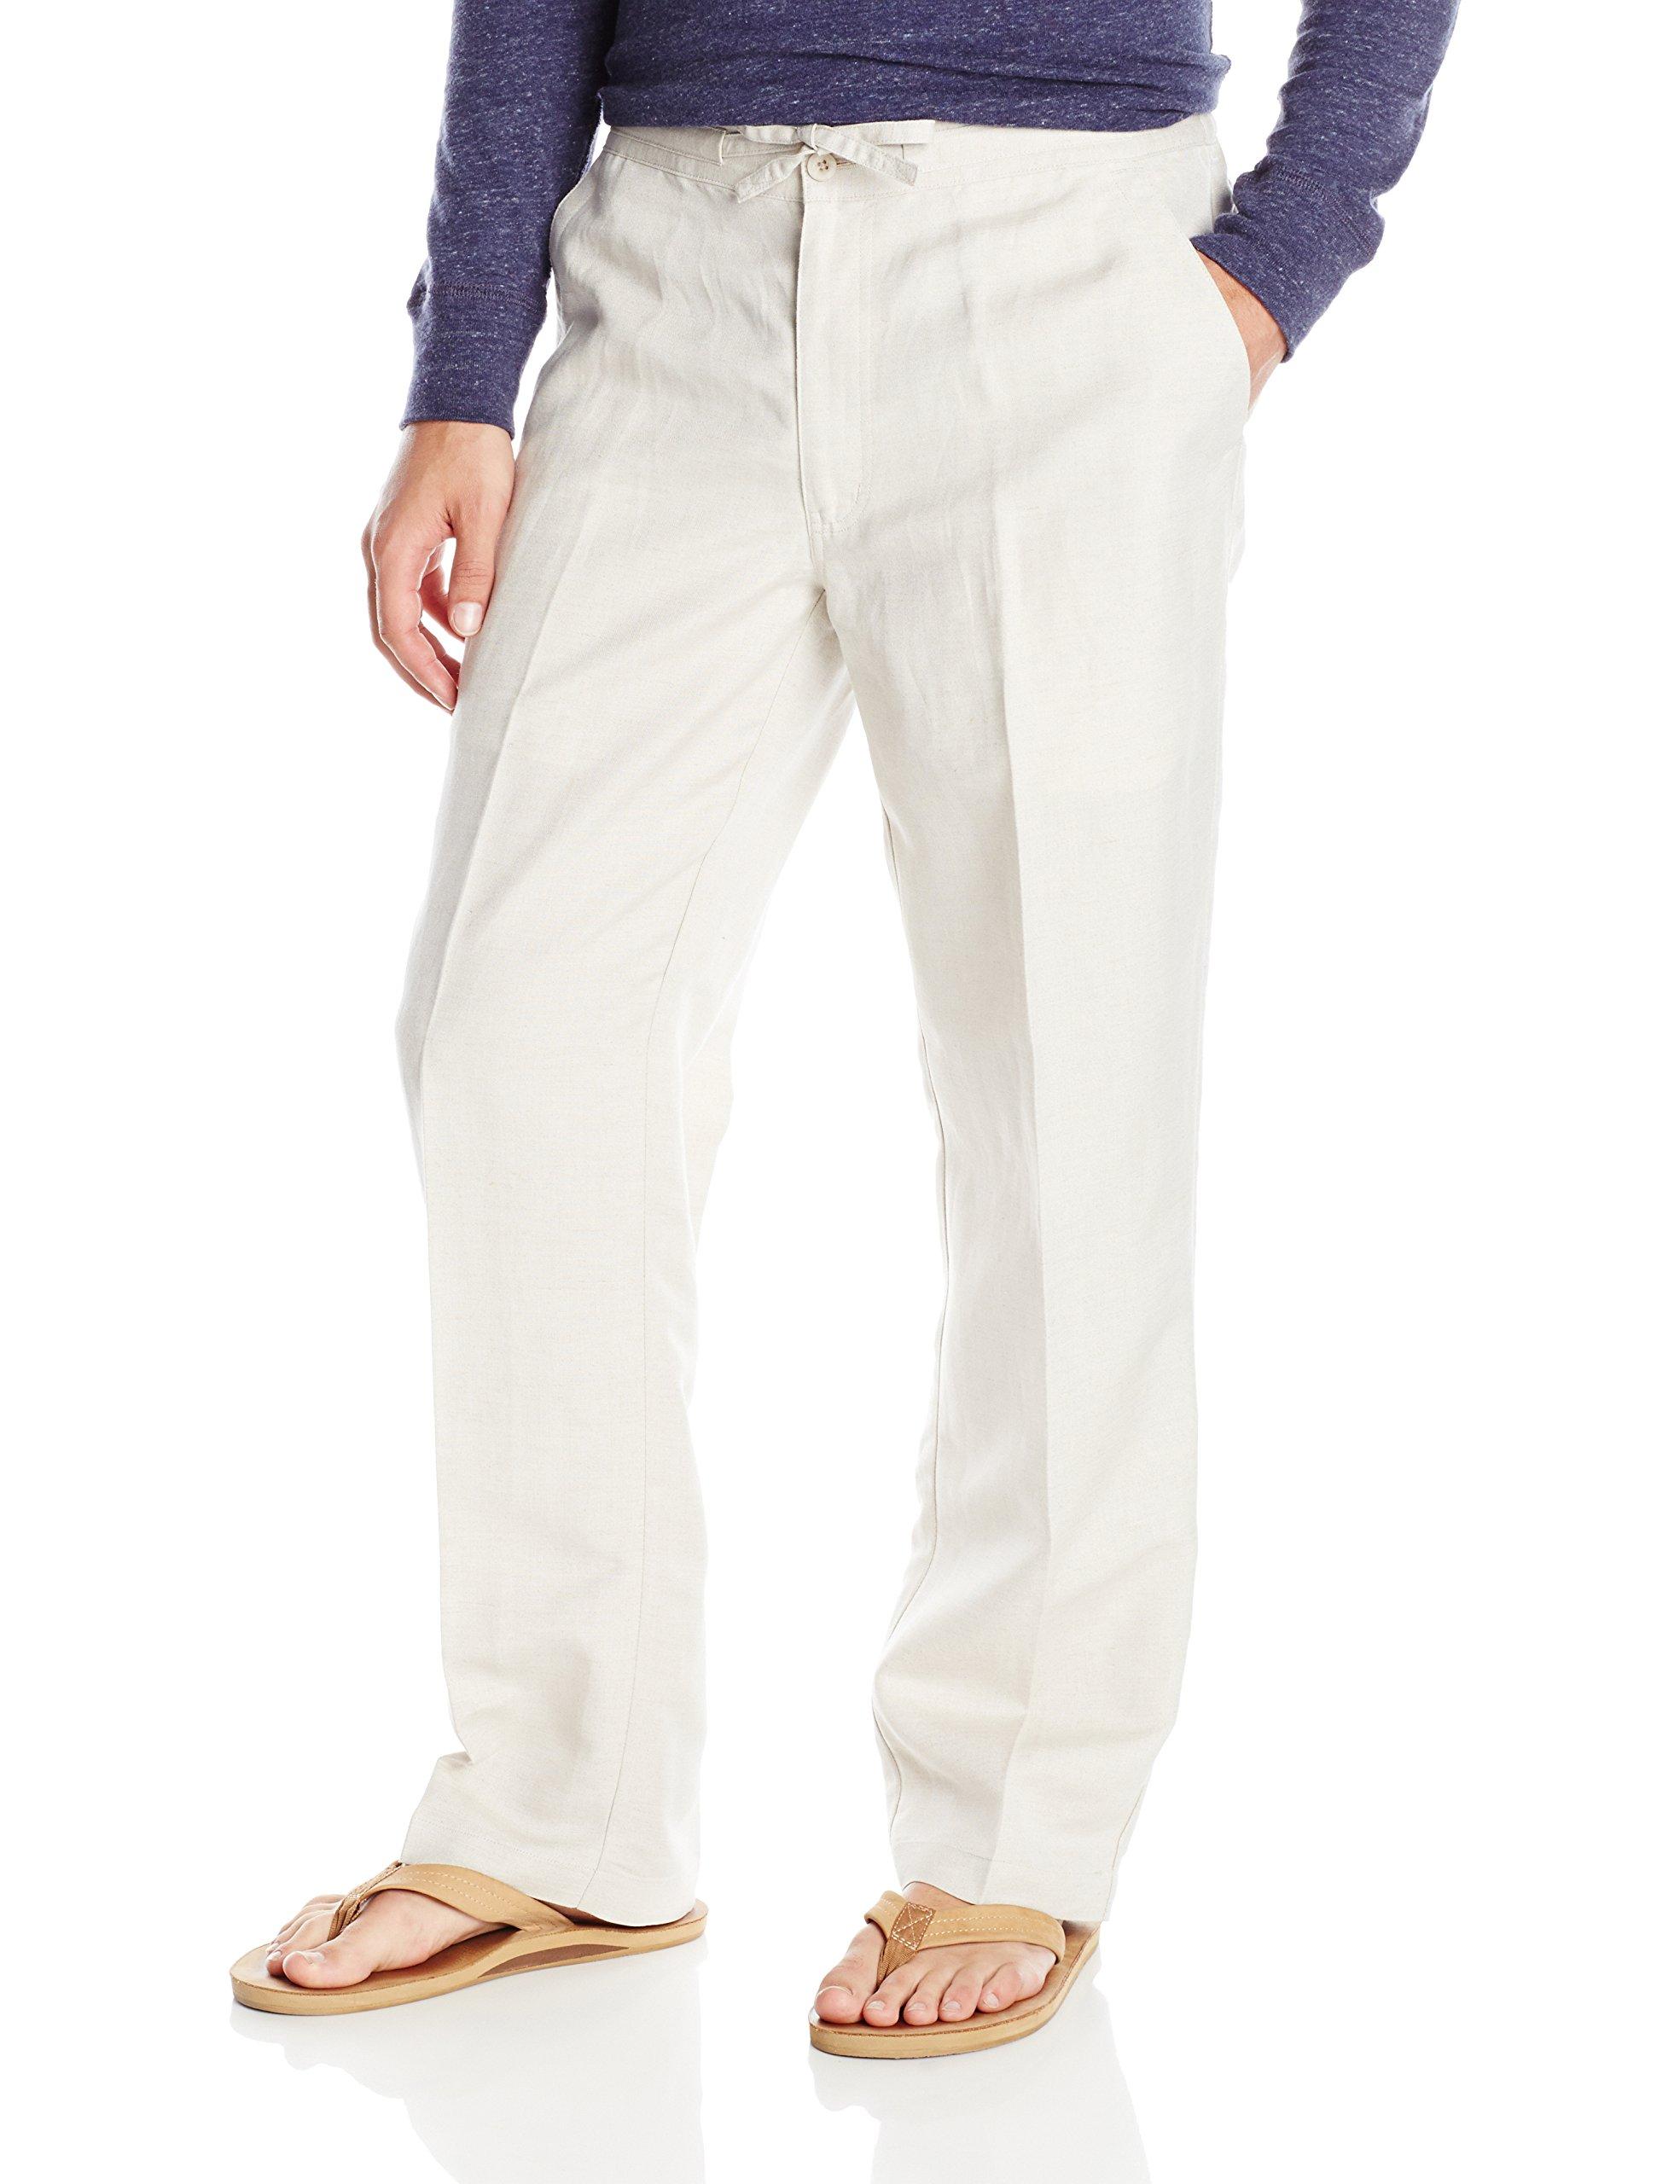 Cubavera Drawstring Pant with Back Elastic Waistband, Natural Linen, Large x 30L